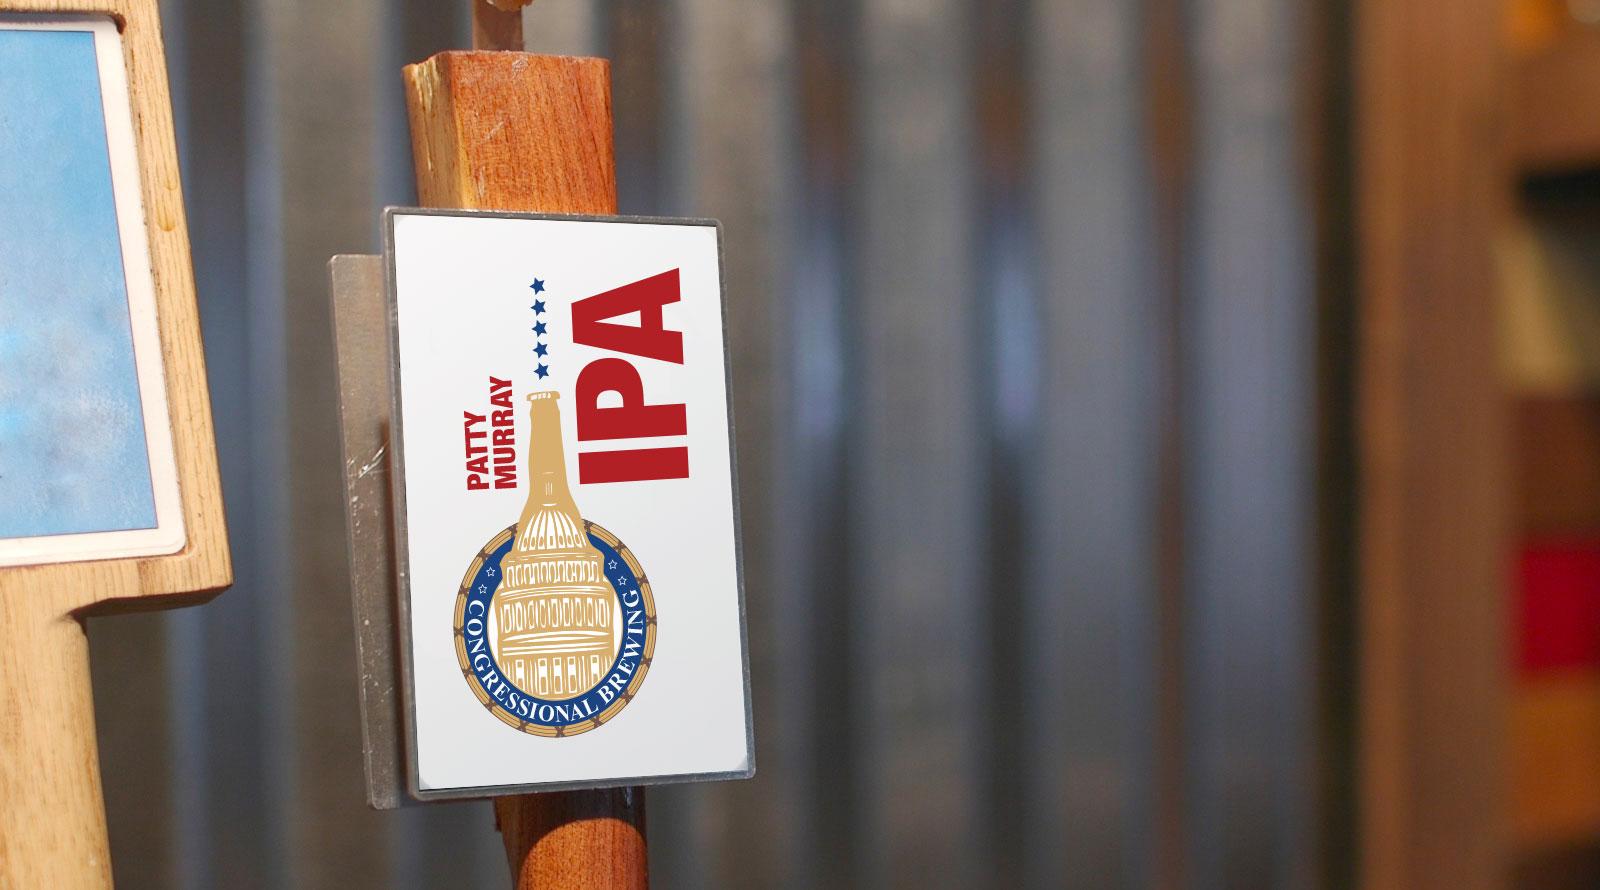 tap-handle